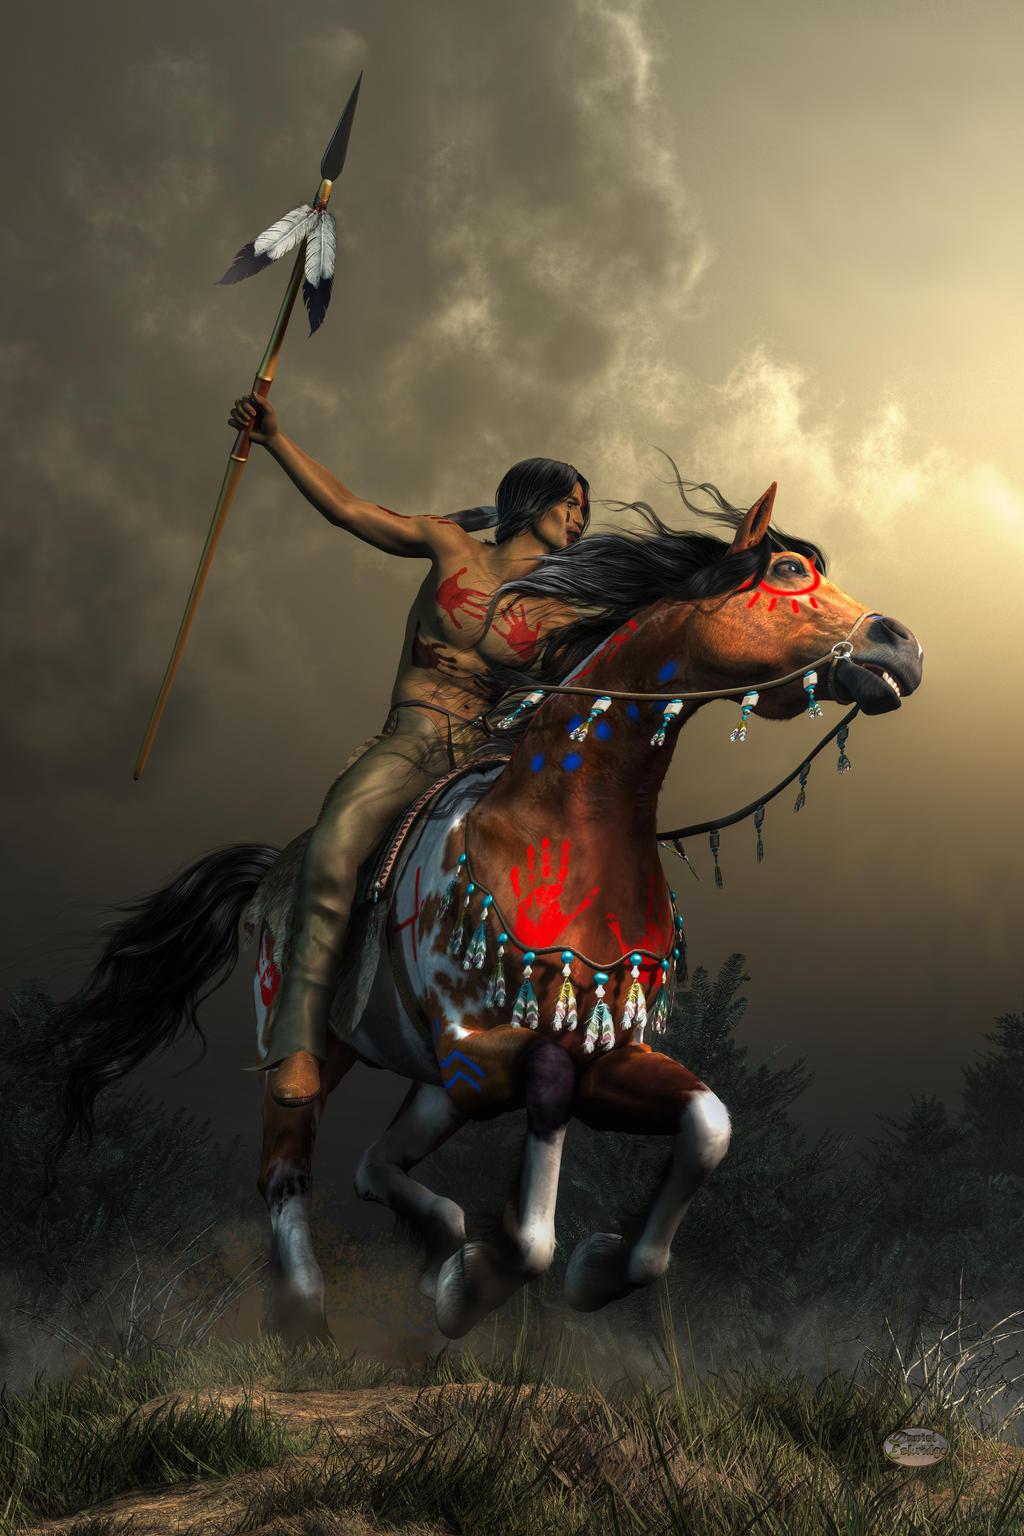 warrior native plain american - photo #19